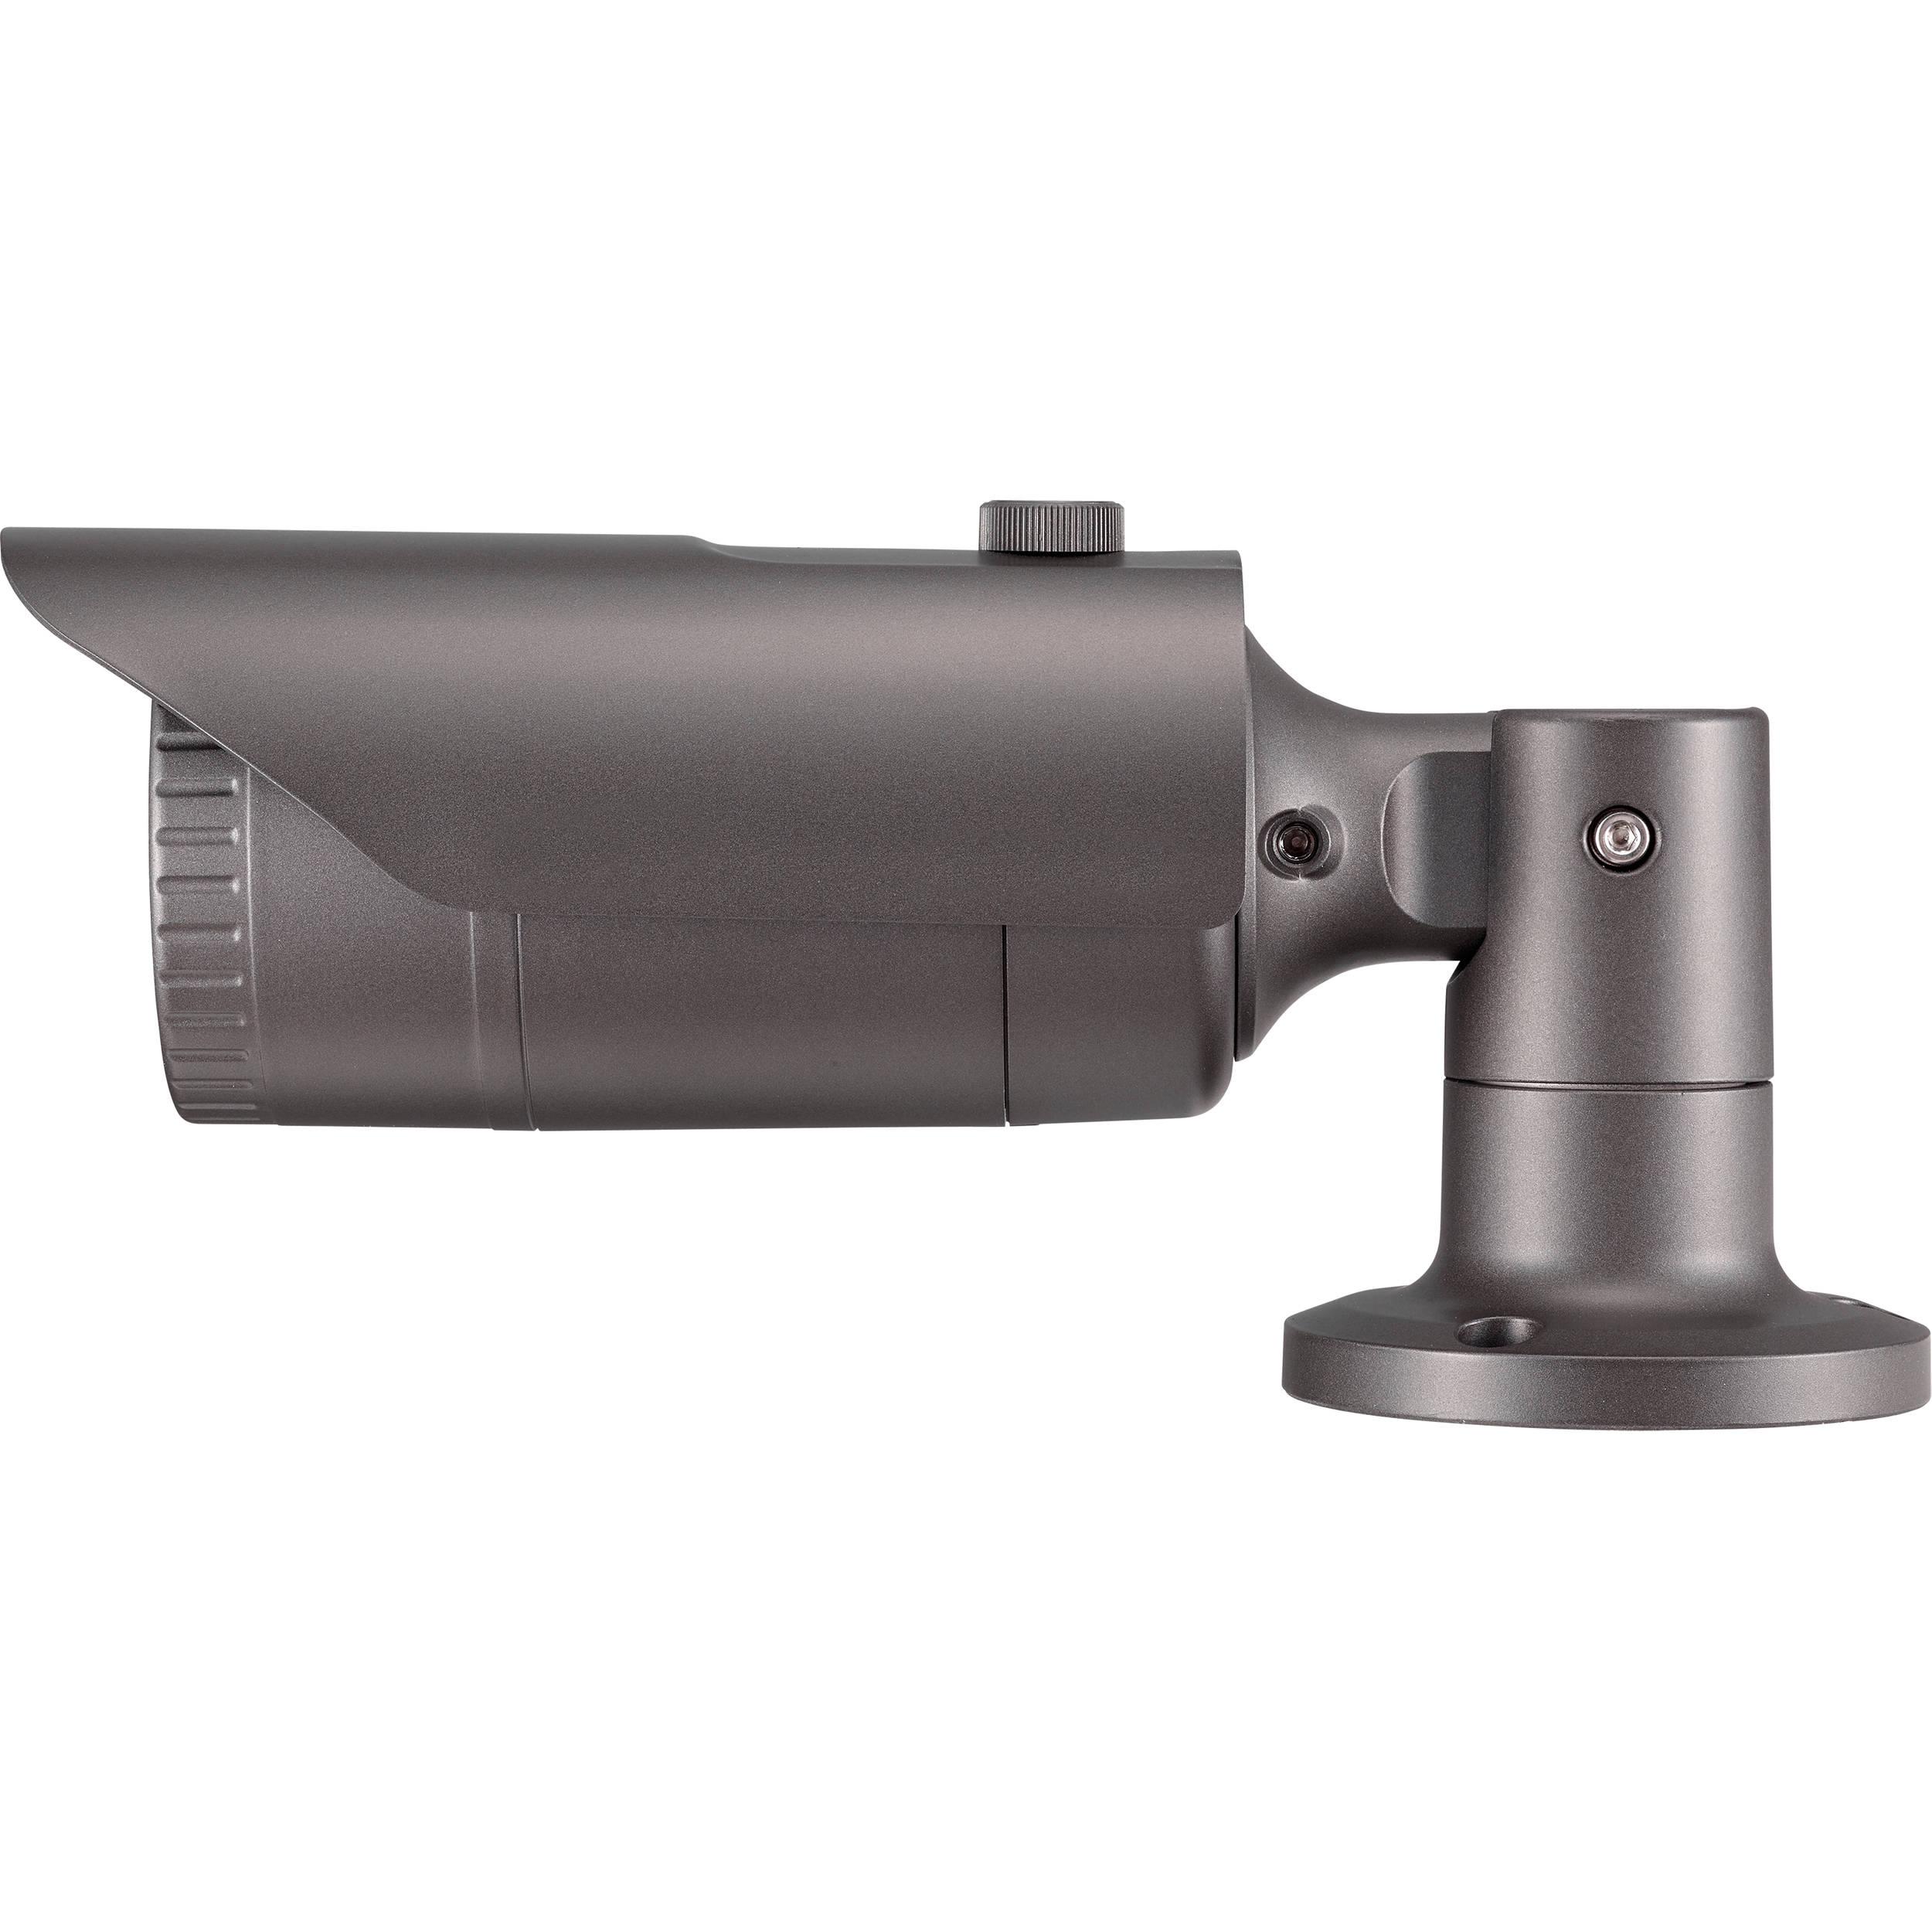 SAMSUNG QNO-7030R 4MP FULL HD OUTDOOR IR LED 6MM POE CCTV SECURITY BULLET CAMERA